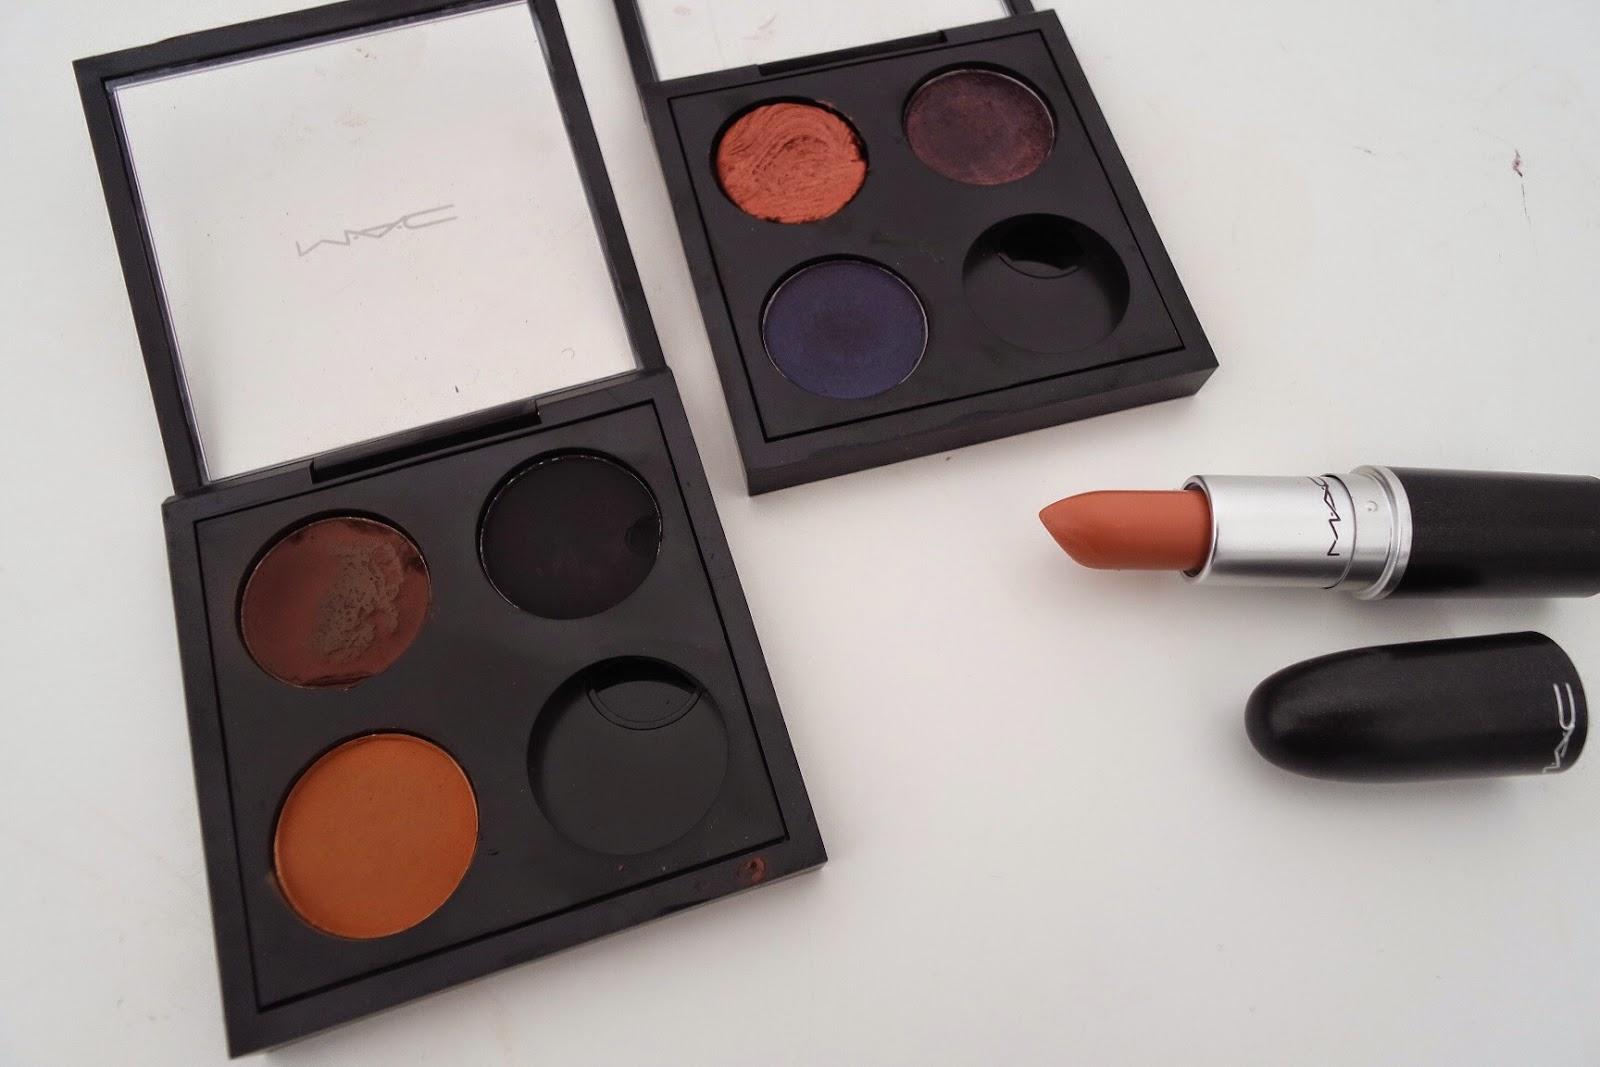 mac quad palette eyeshadow lipstick